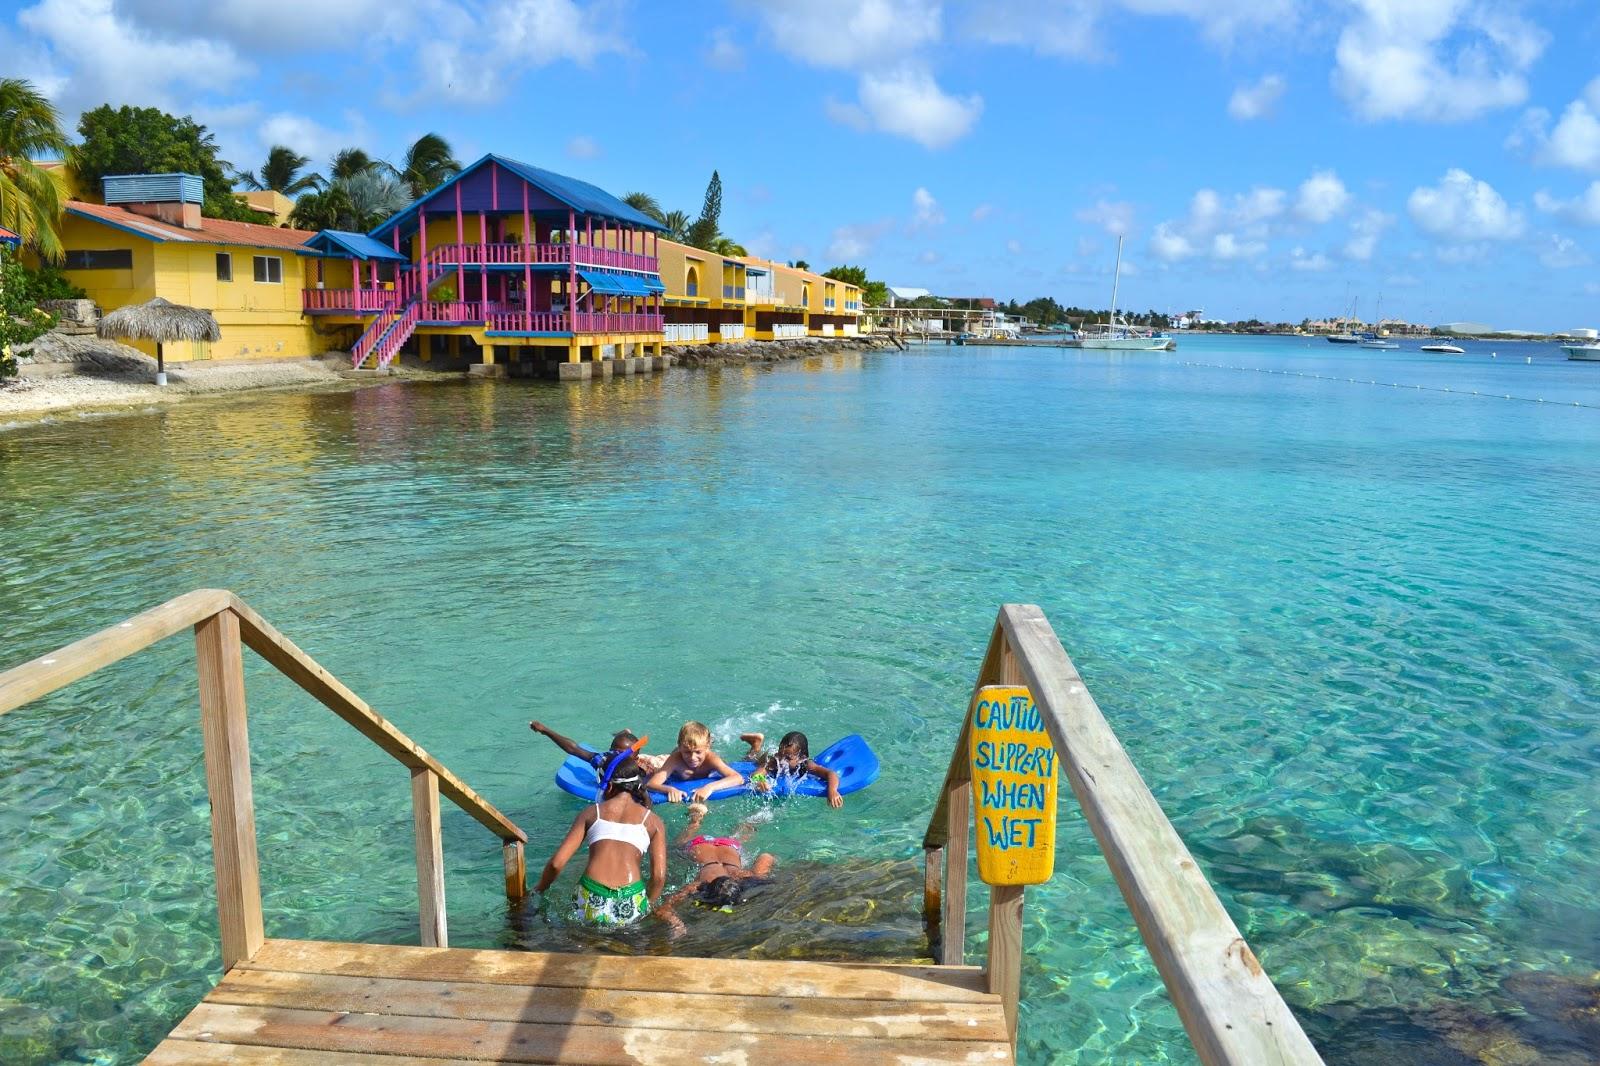 Bonaire saint eustatius and saba travel guide - Divi builder 2 0 7 ...